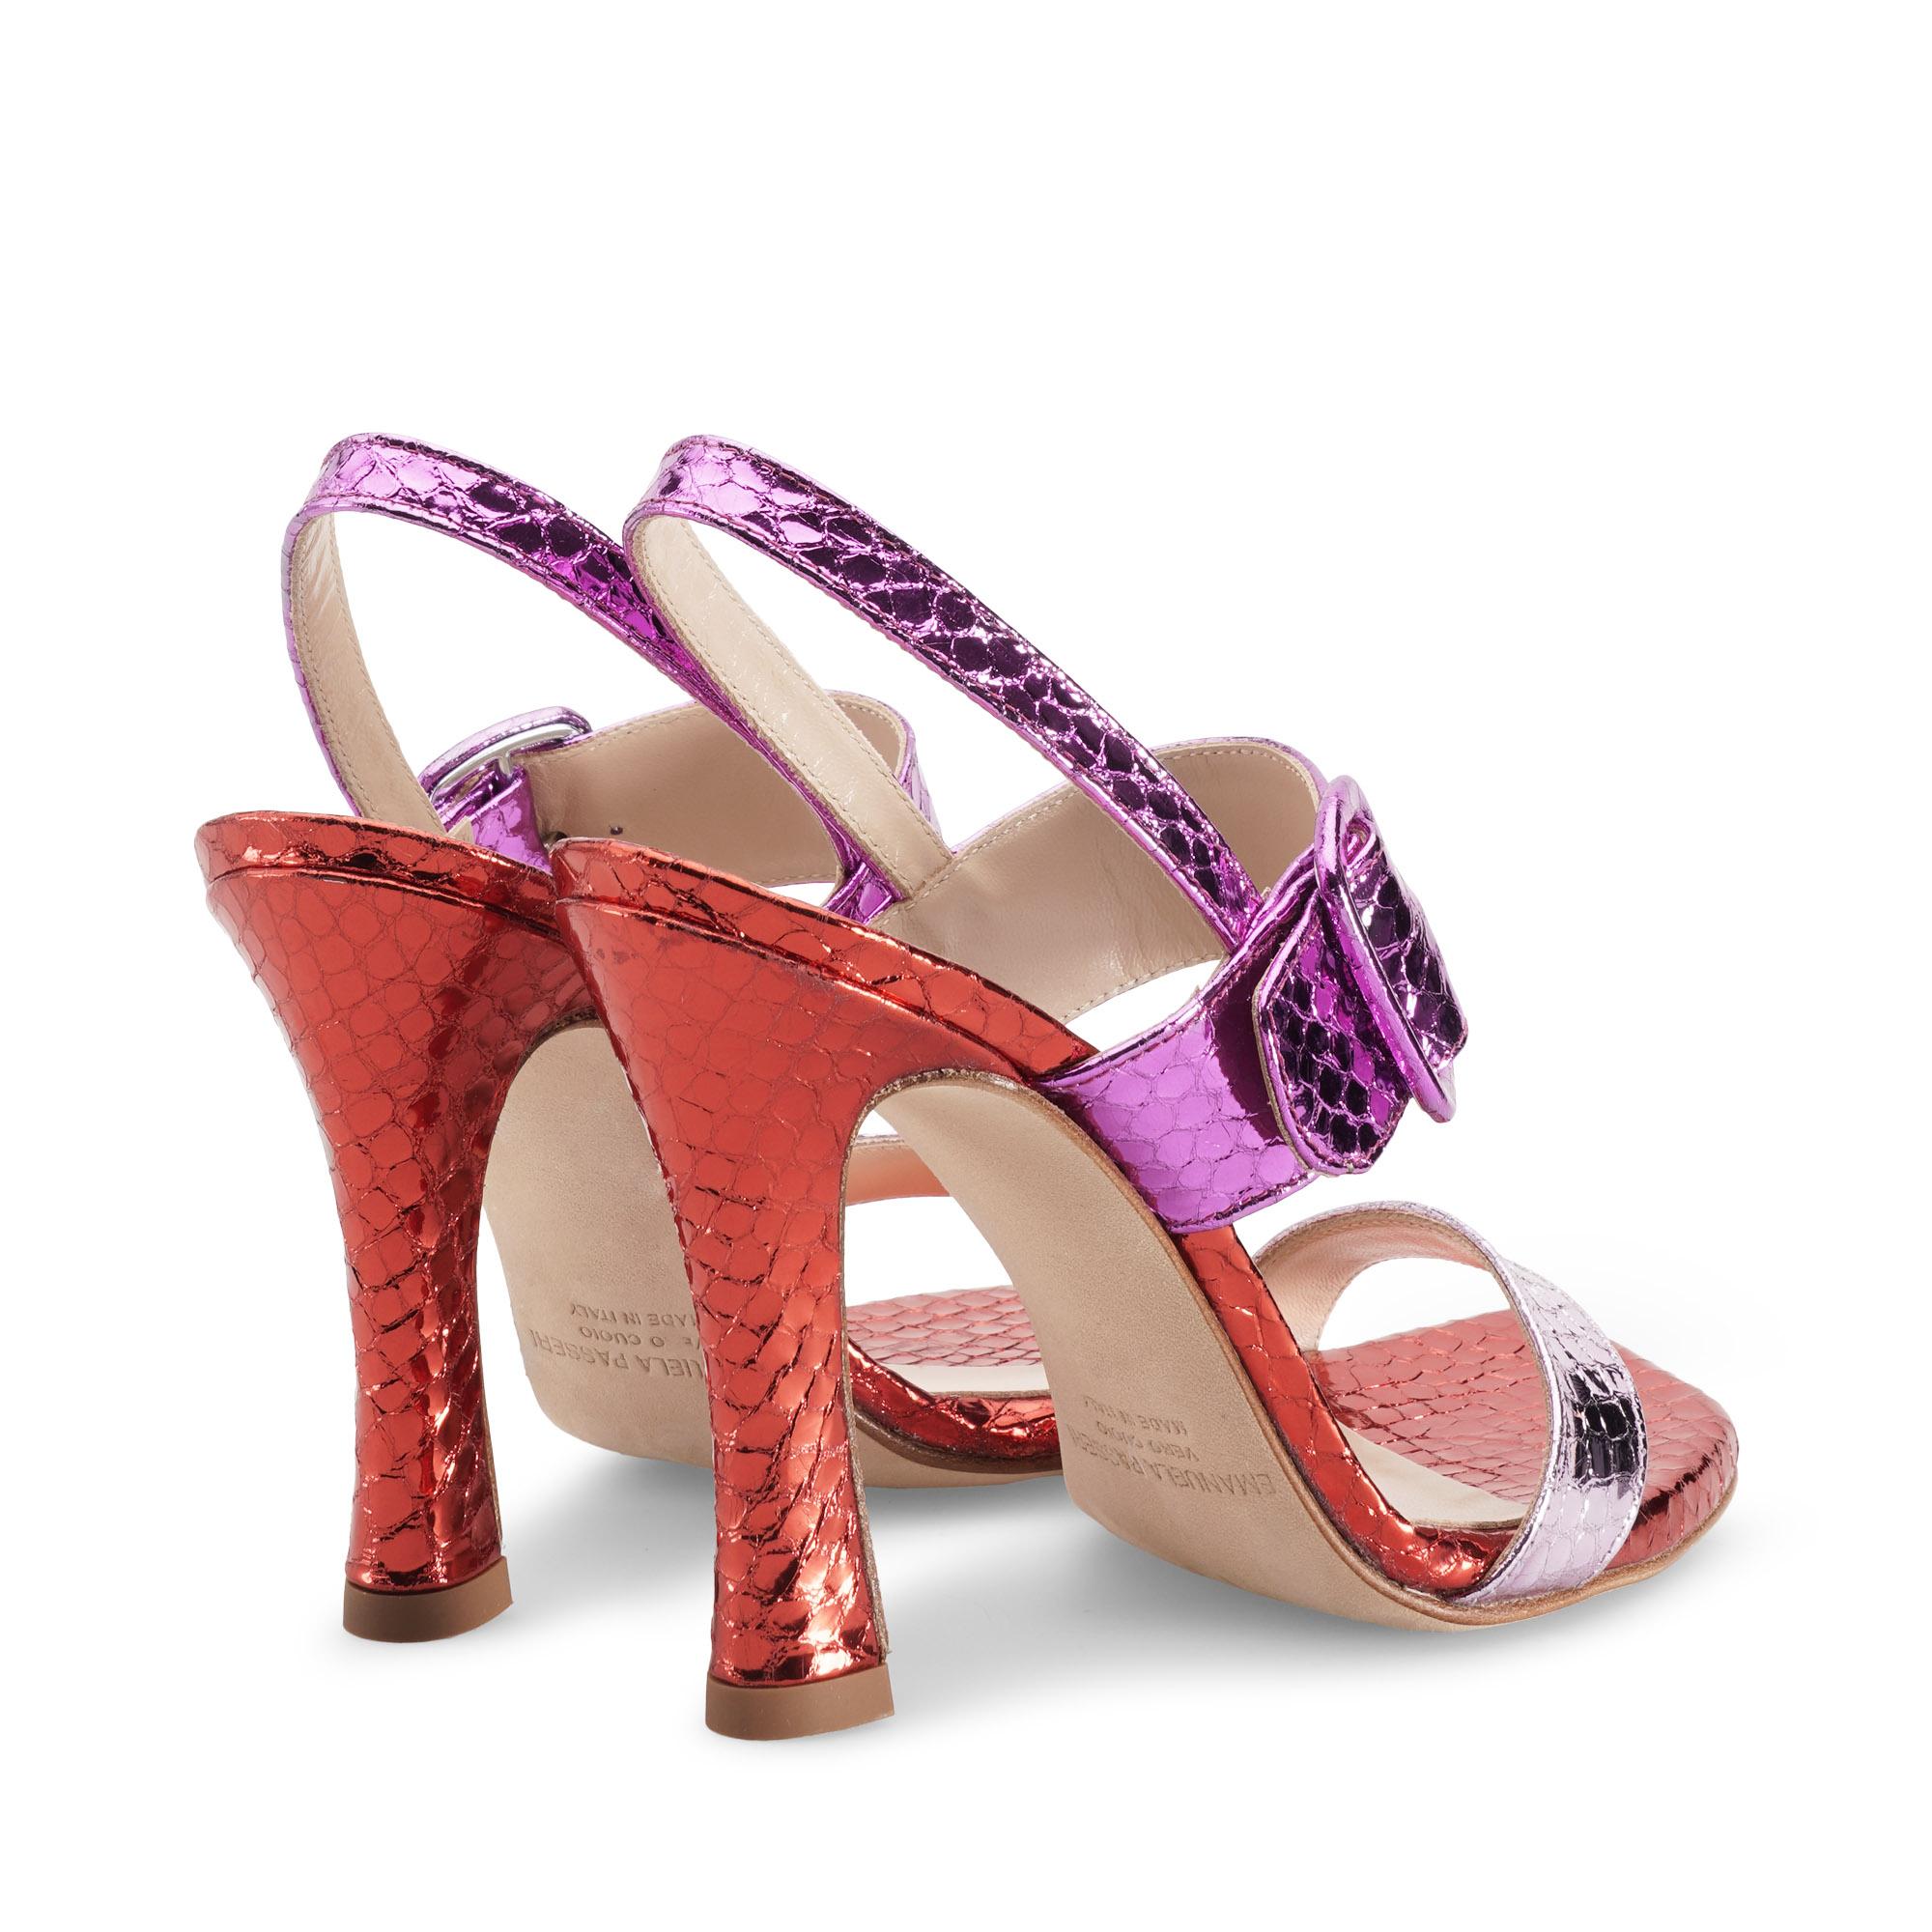 sandalo-donna-pitone-laminato-tosa-fuxia-rosso-emanuela-passeri-shoes-heels-spring-summer-2021